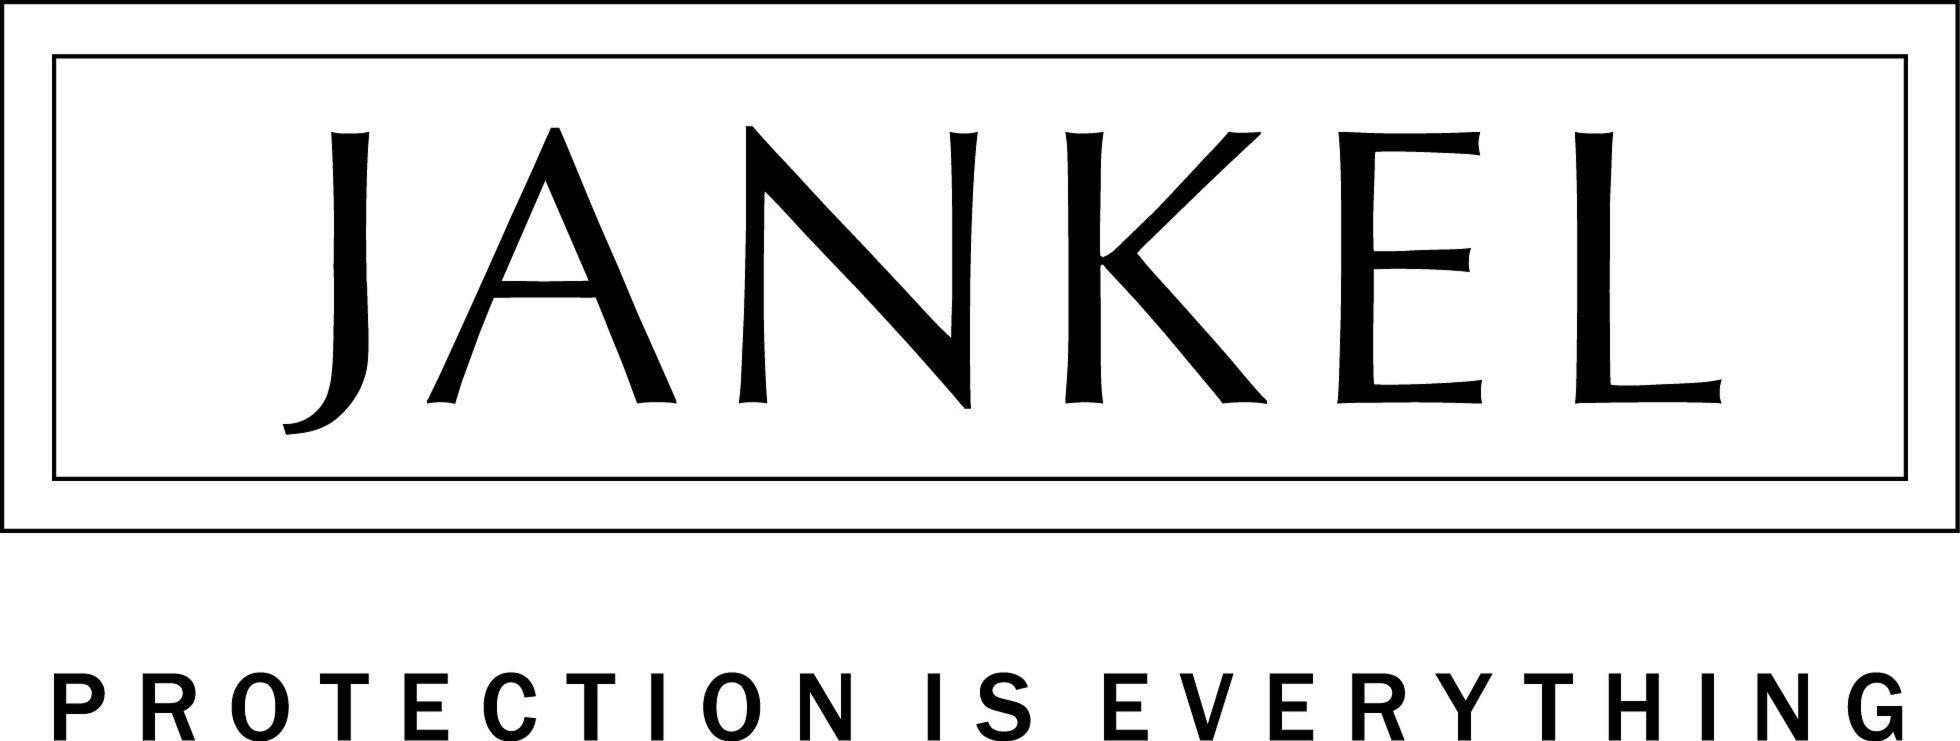 Jankel Armouring Ltd